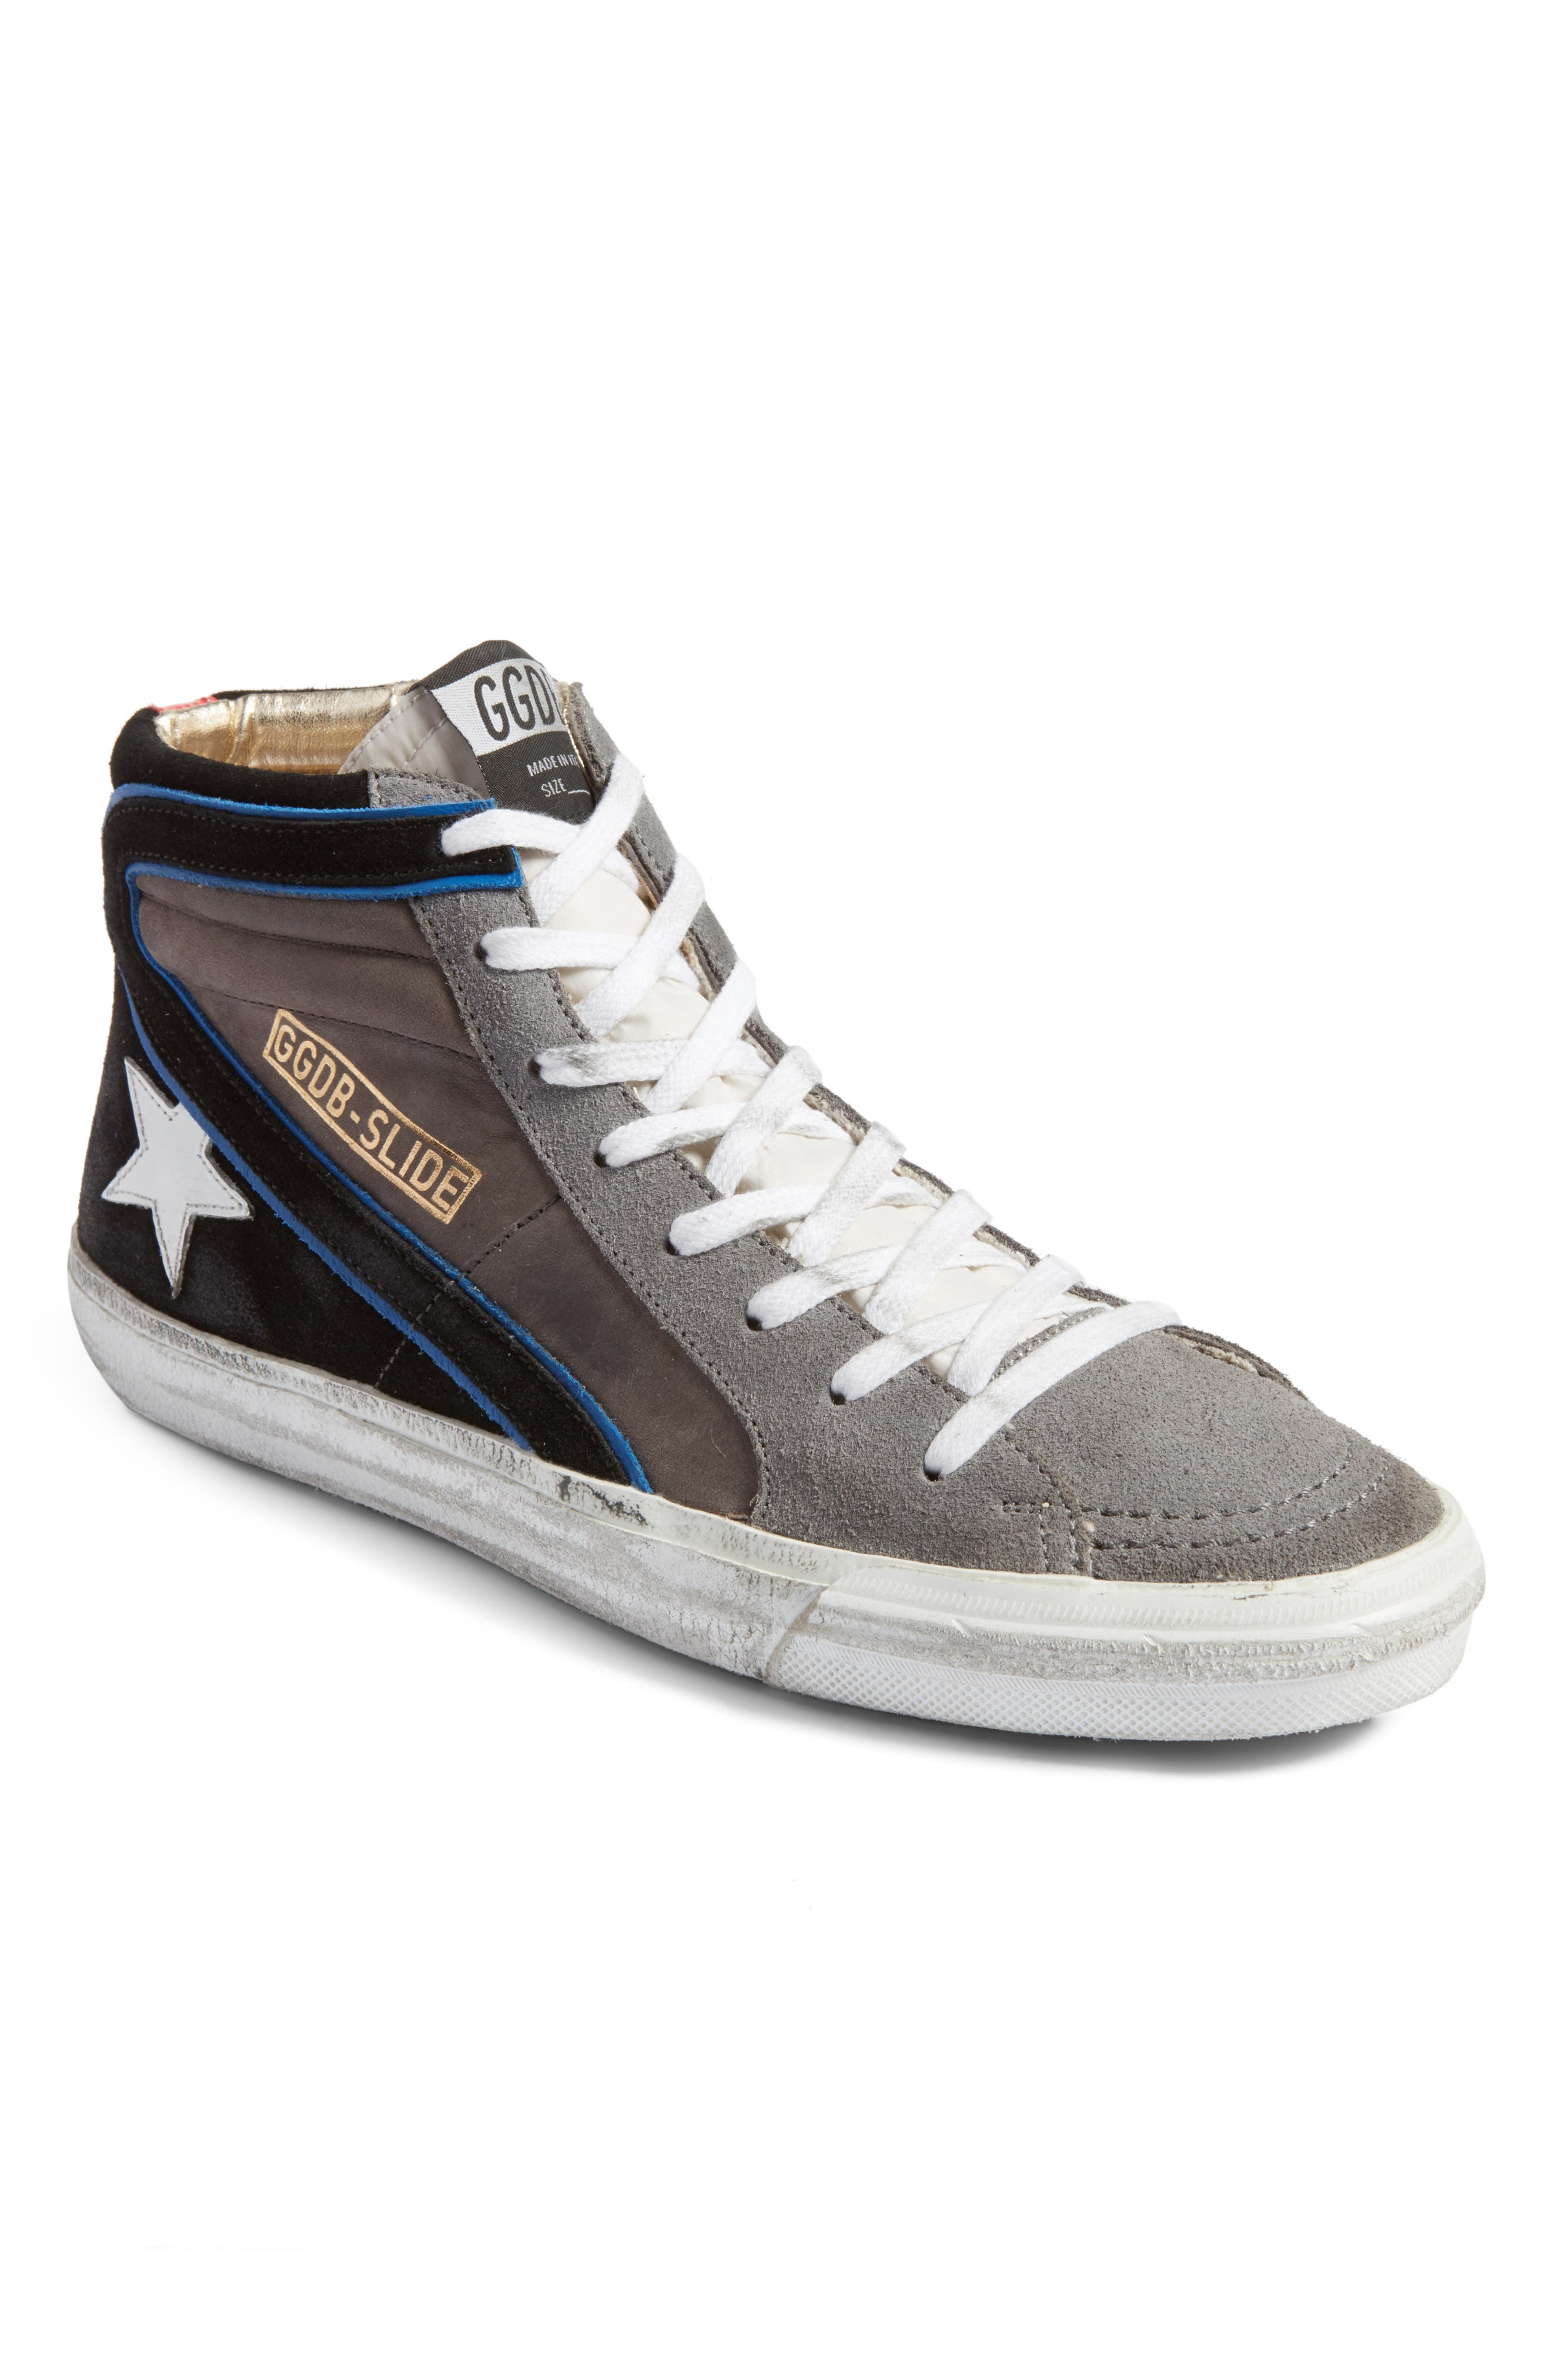 Slide High Top Sneaker,                             Main thumbnail 1, color,                             021